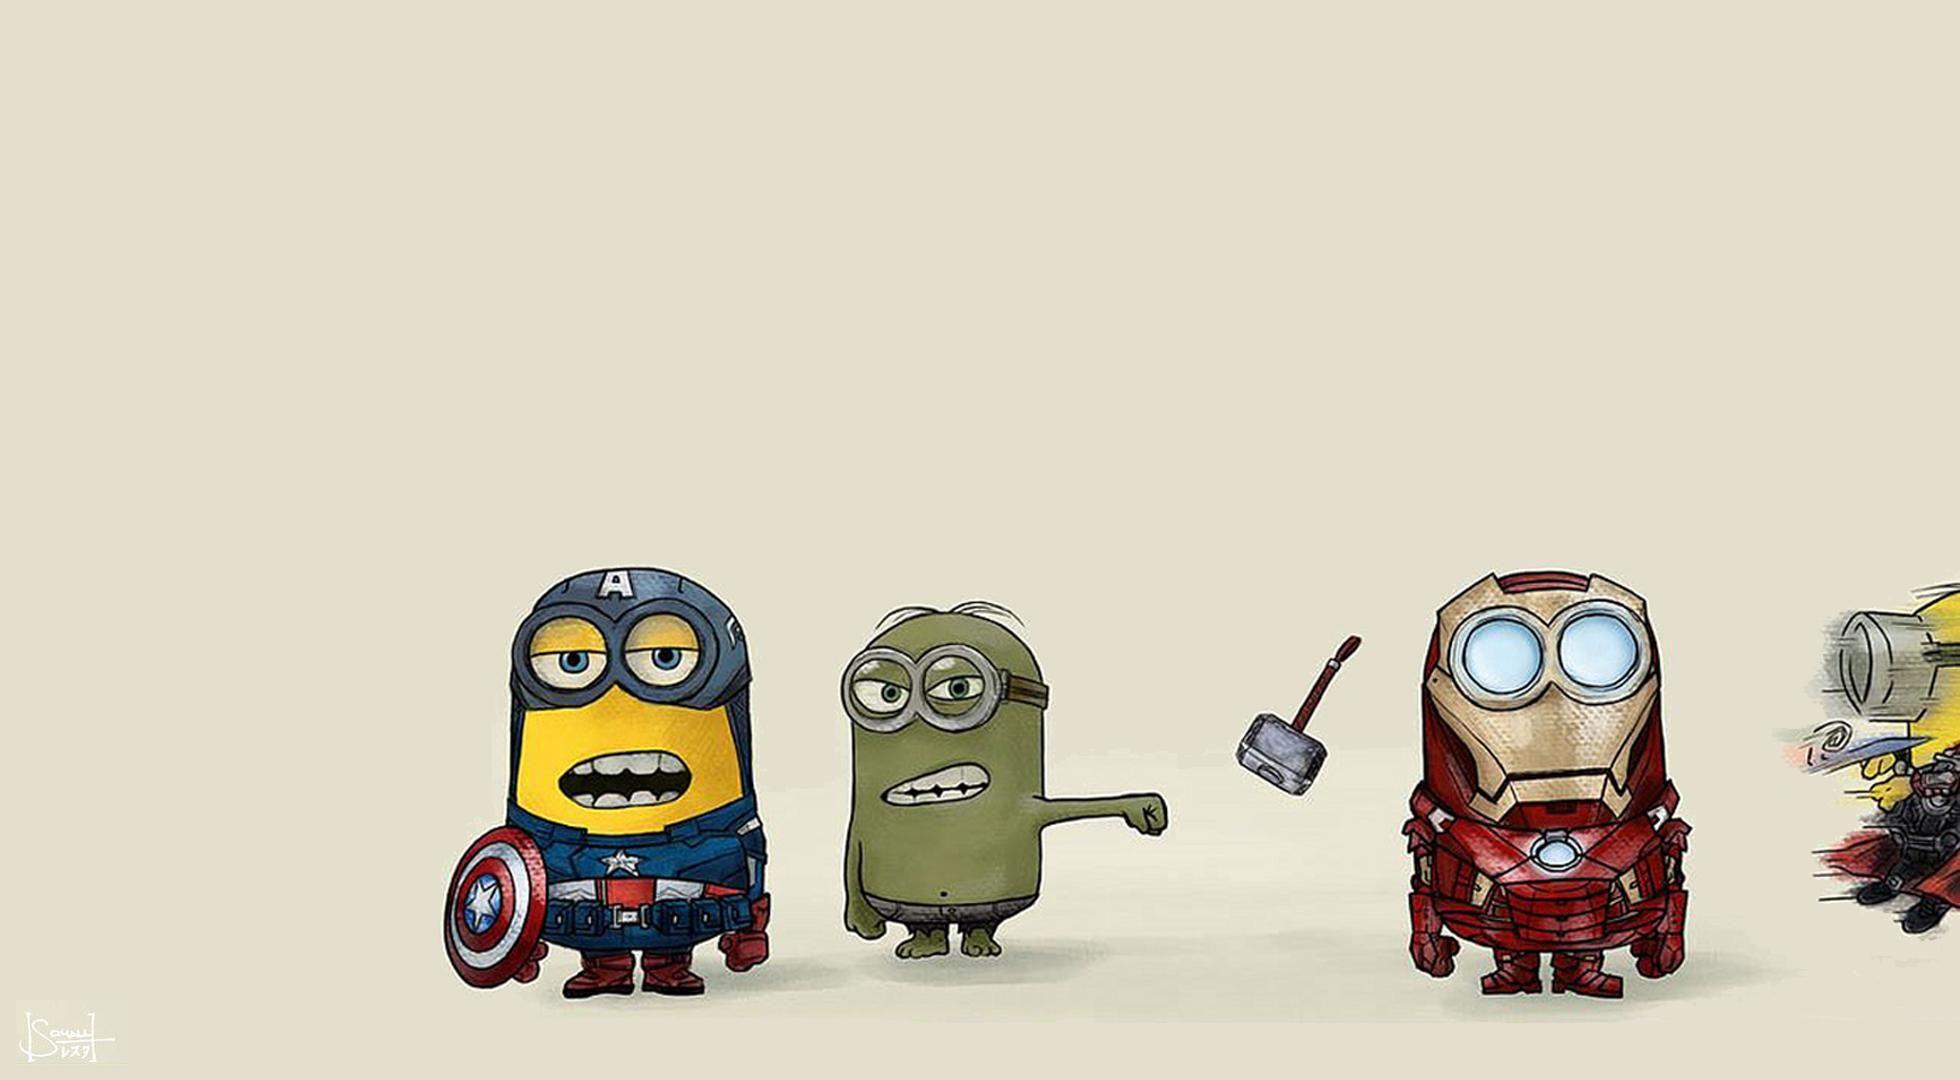 Despicable Me Avengers Wallpaper